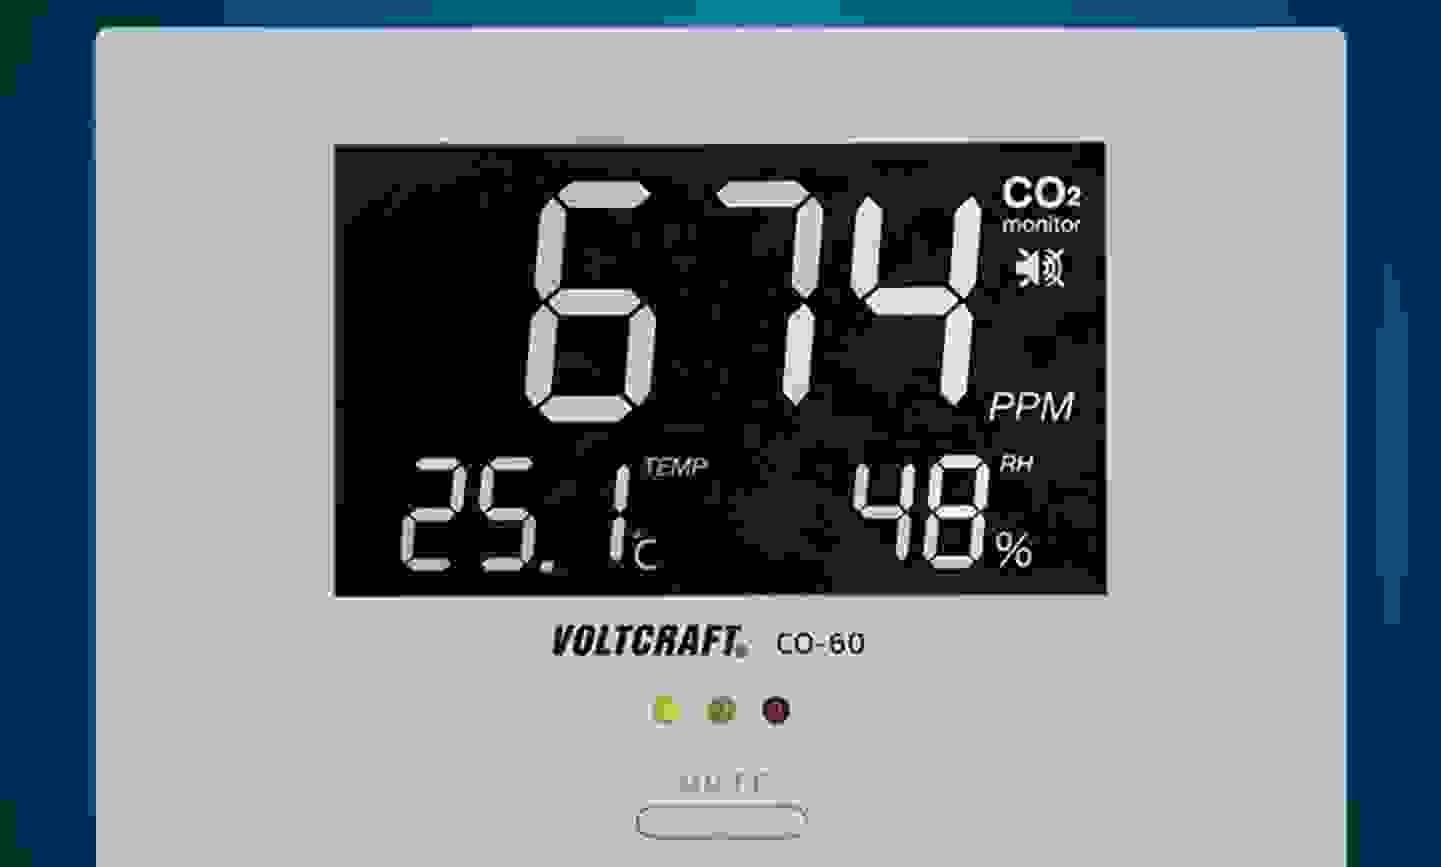 Voltcraft - CO-60 Kohlendioxid-Messgerät 0 - 3000 ppm »